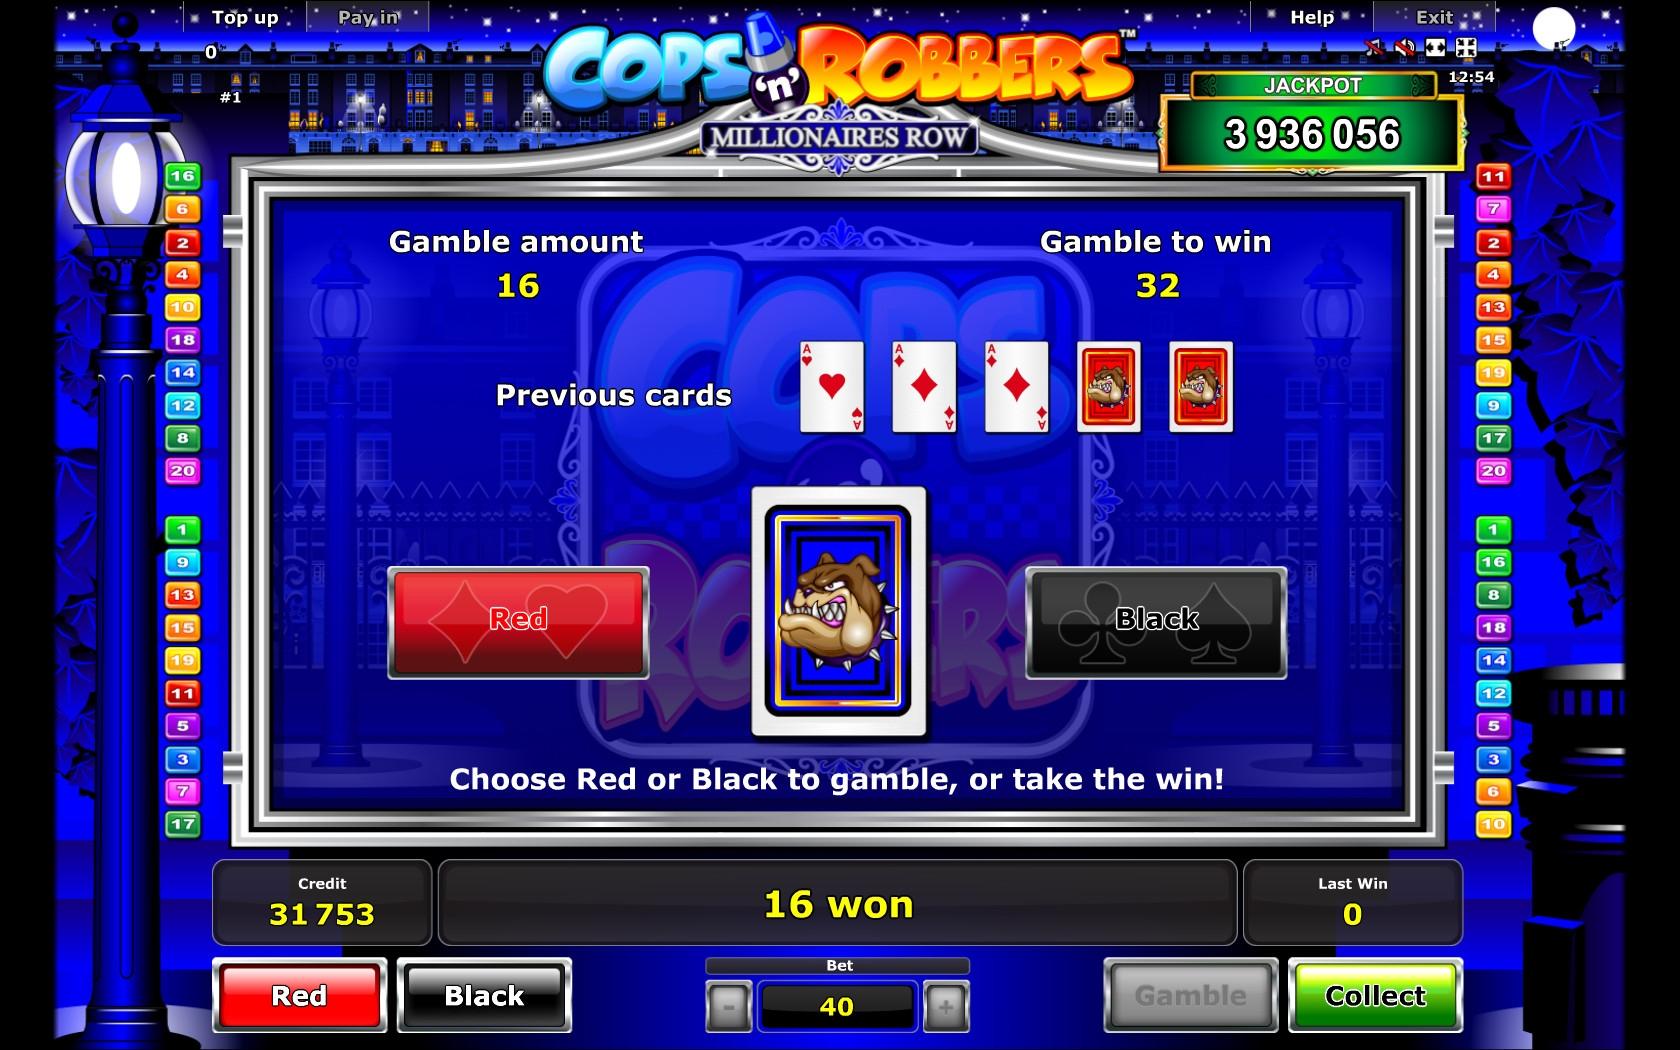 Cops n Robbers Millionaires Row - Casumo Casino